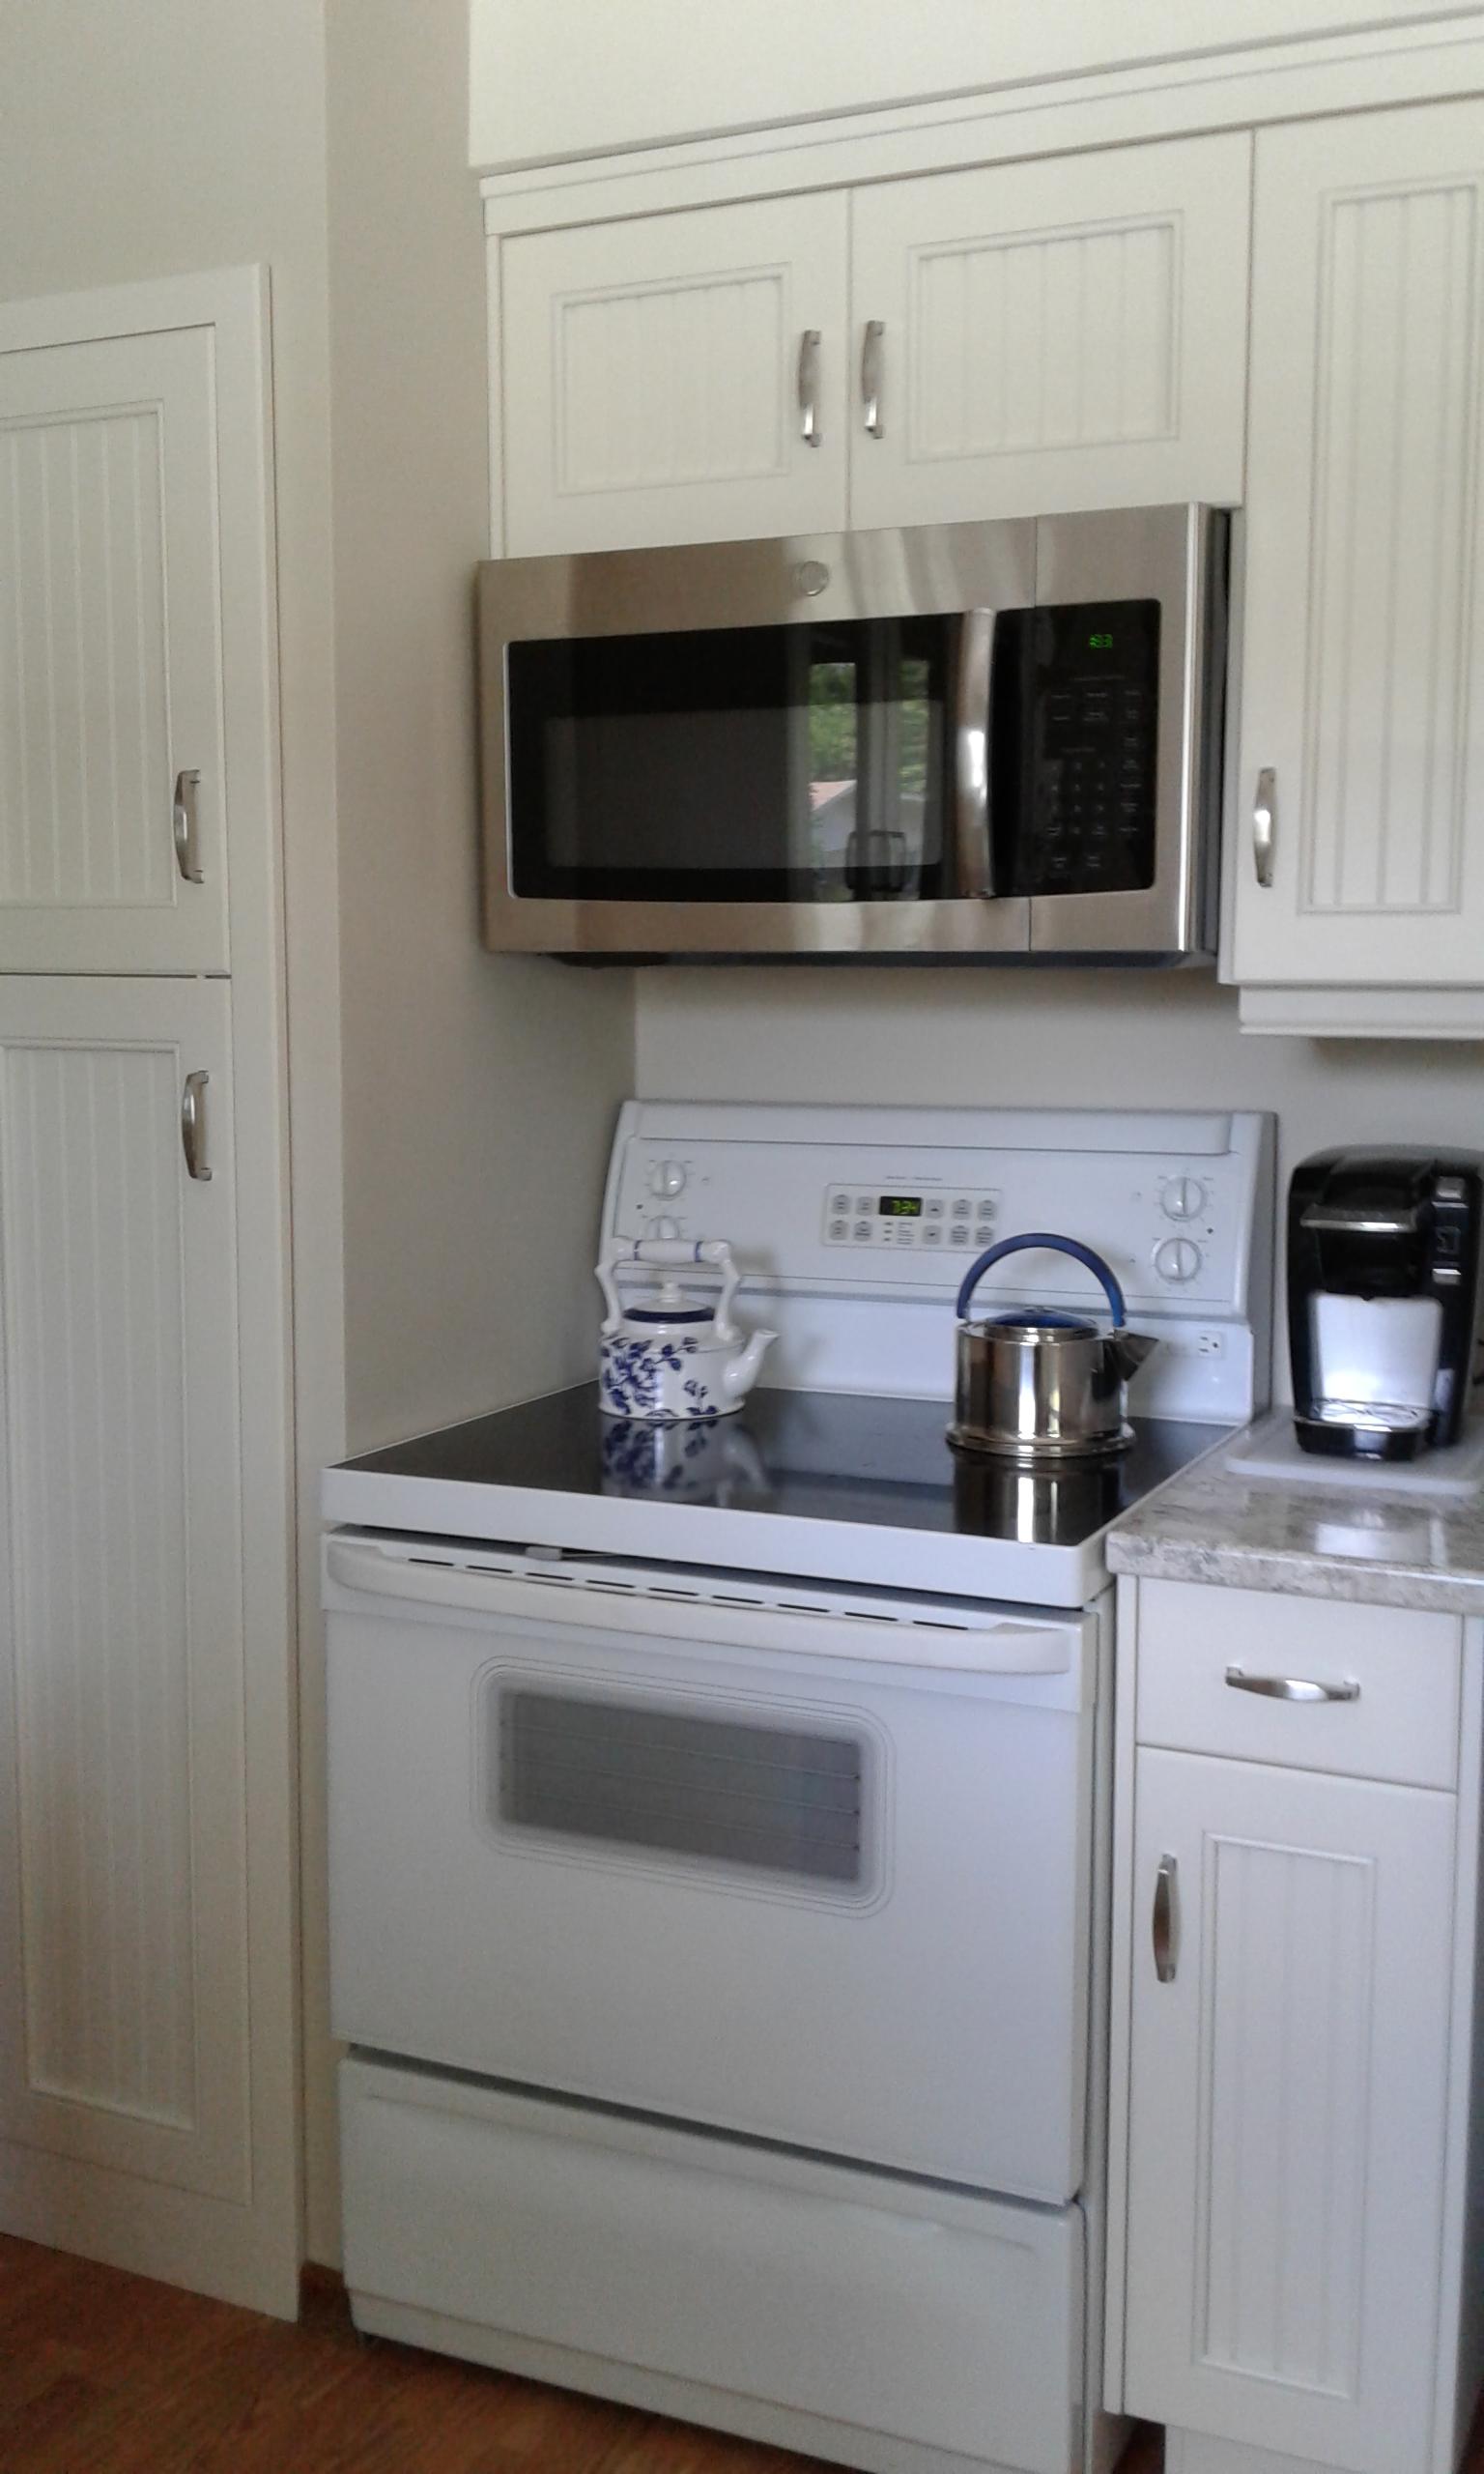 Kitchen Reno - Stove and Pantry